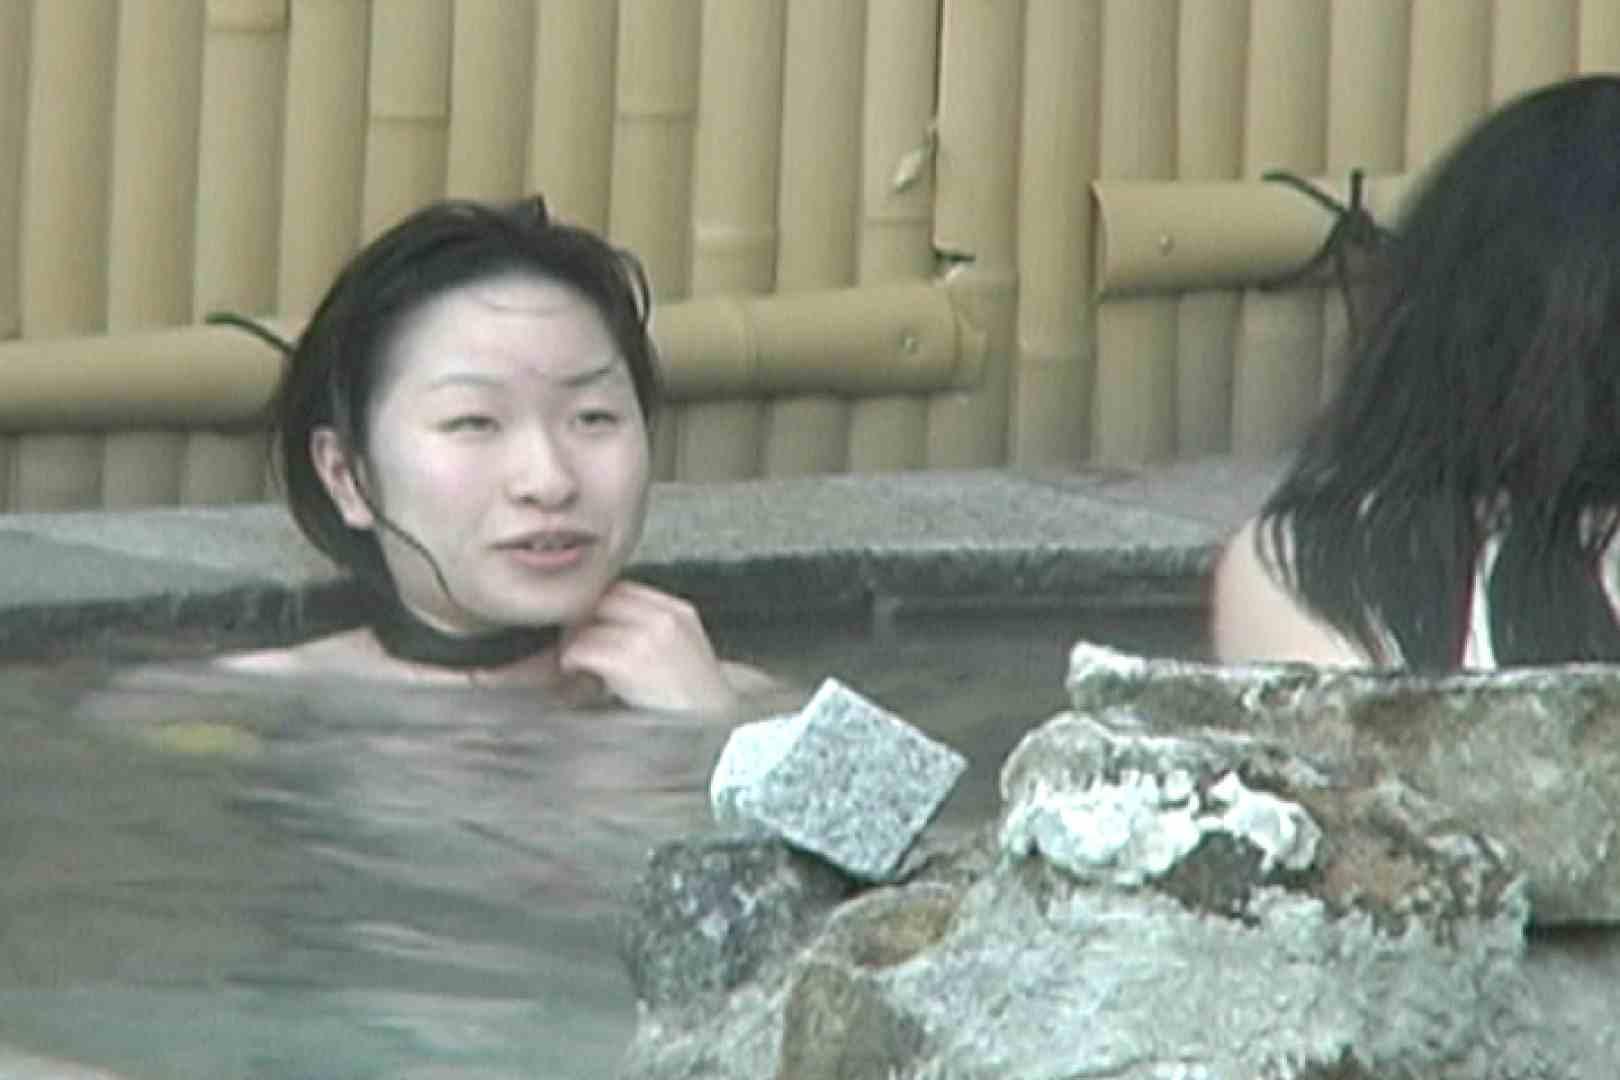 Aquaな露天風呂Vol.595 OLセックス 覗きぱこり動画紹介 89画像 74